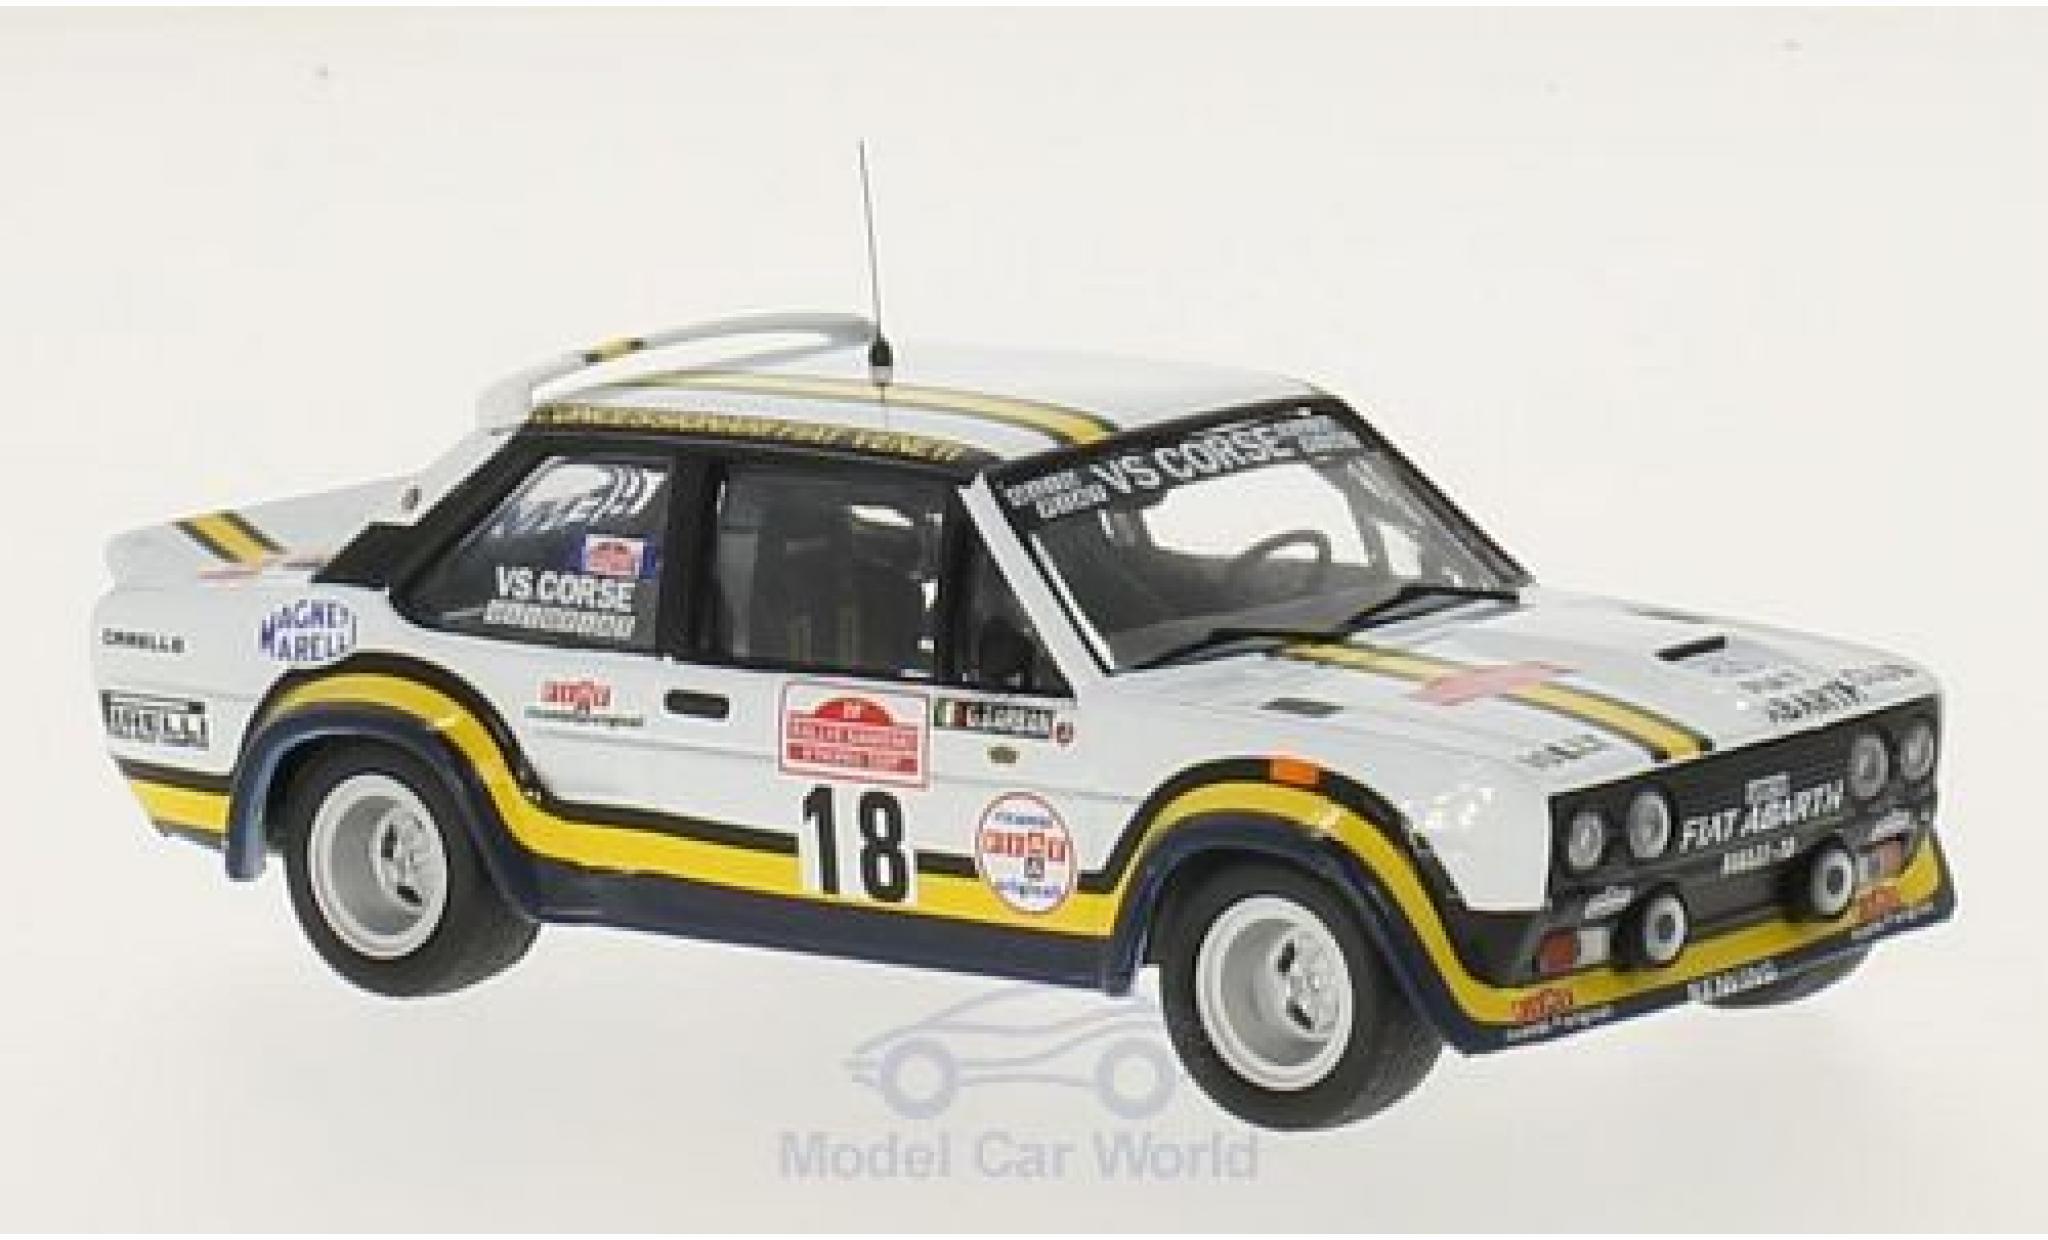 Fiat 131 1/43 IXO Abarth No.18 VS Corse Rallye WM Rallye Sanremo 1978 A.Pasetti/G.Barban